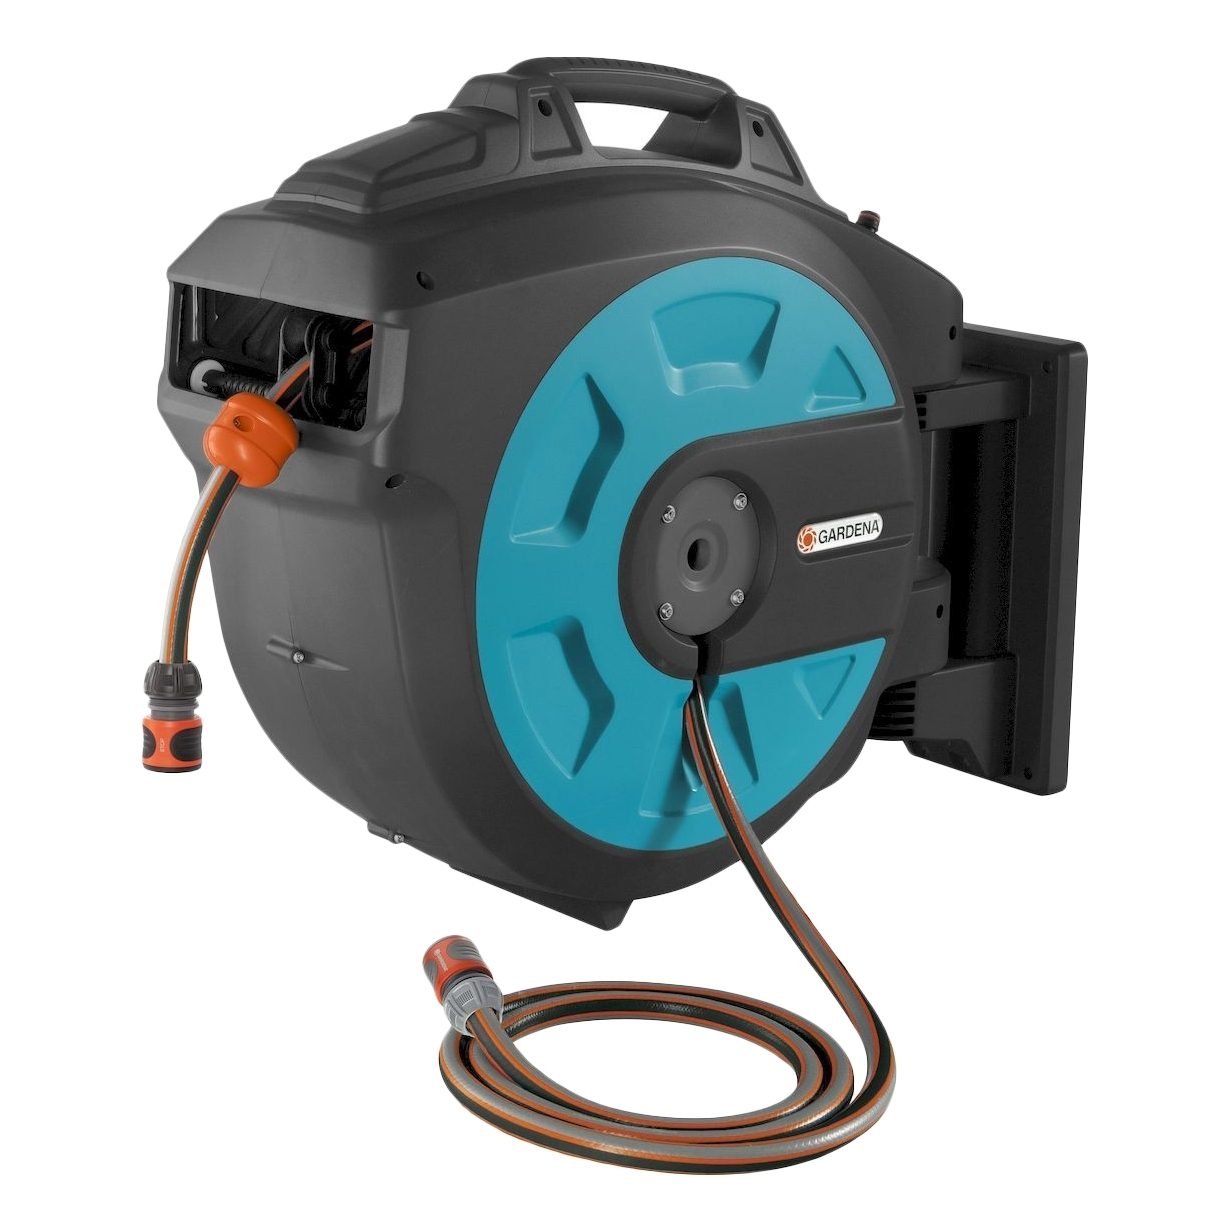 Coil поливочным hose GARDENA 08024-20.000.00 (frost protection, automatic winding hose anti-theft, kinklight 08024